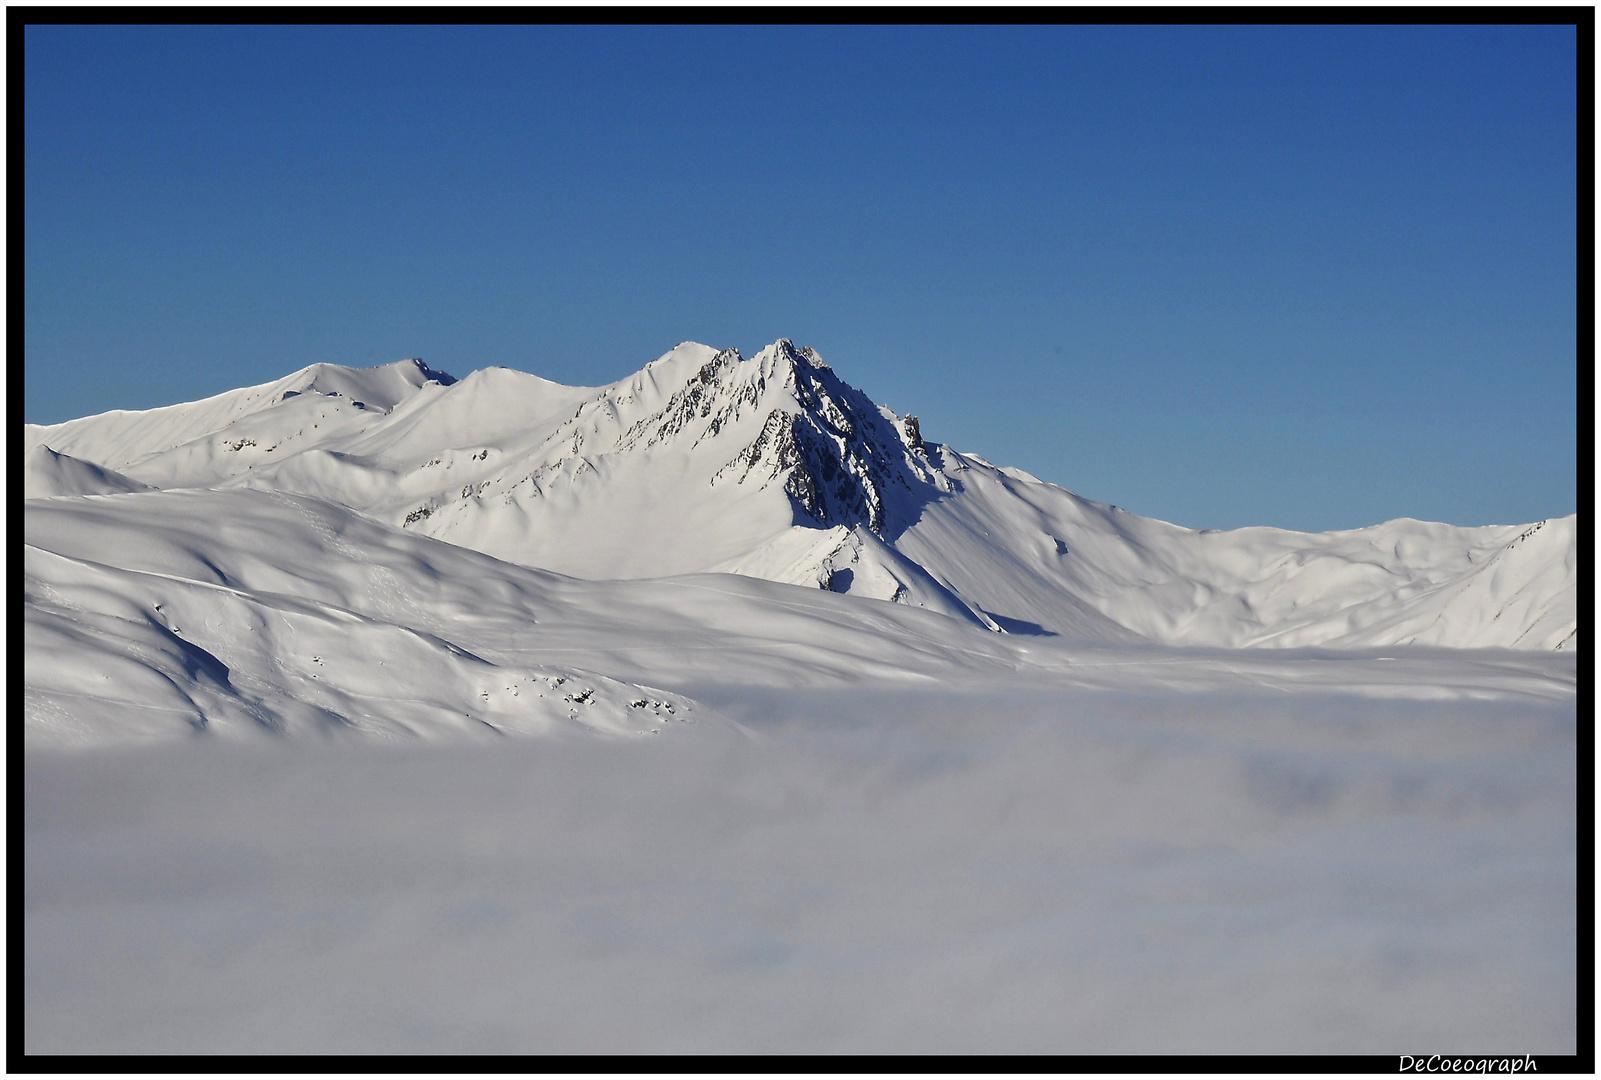 Gipfel im Wolkenmeer